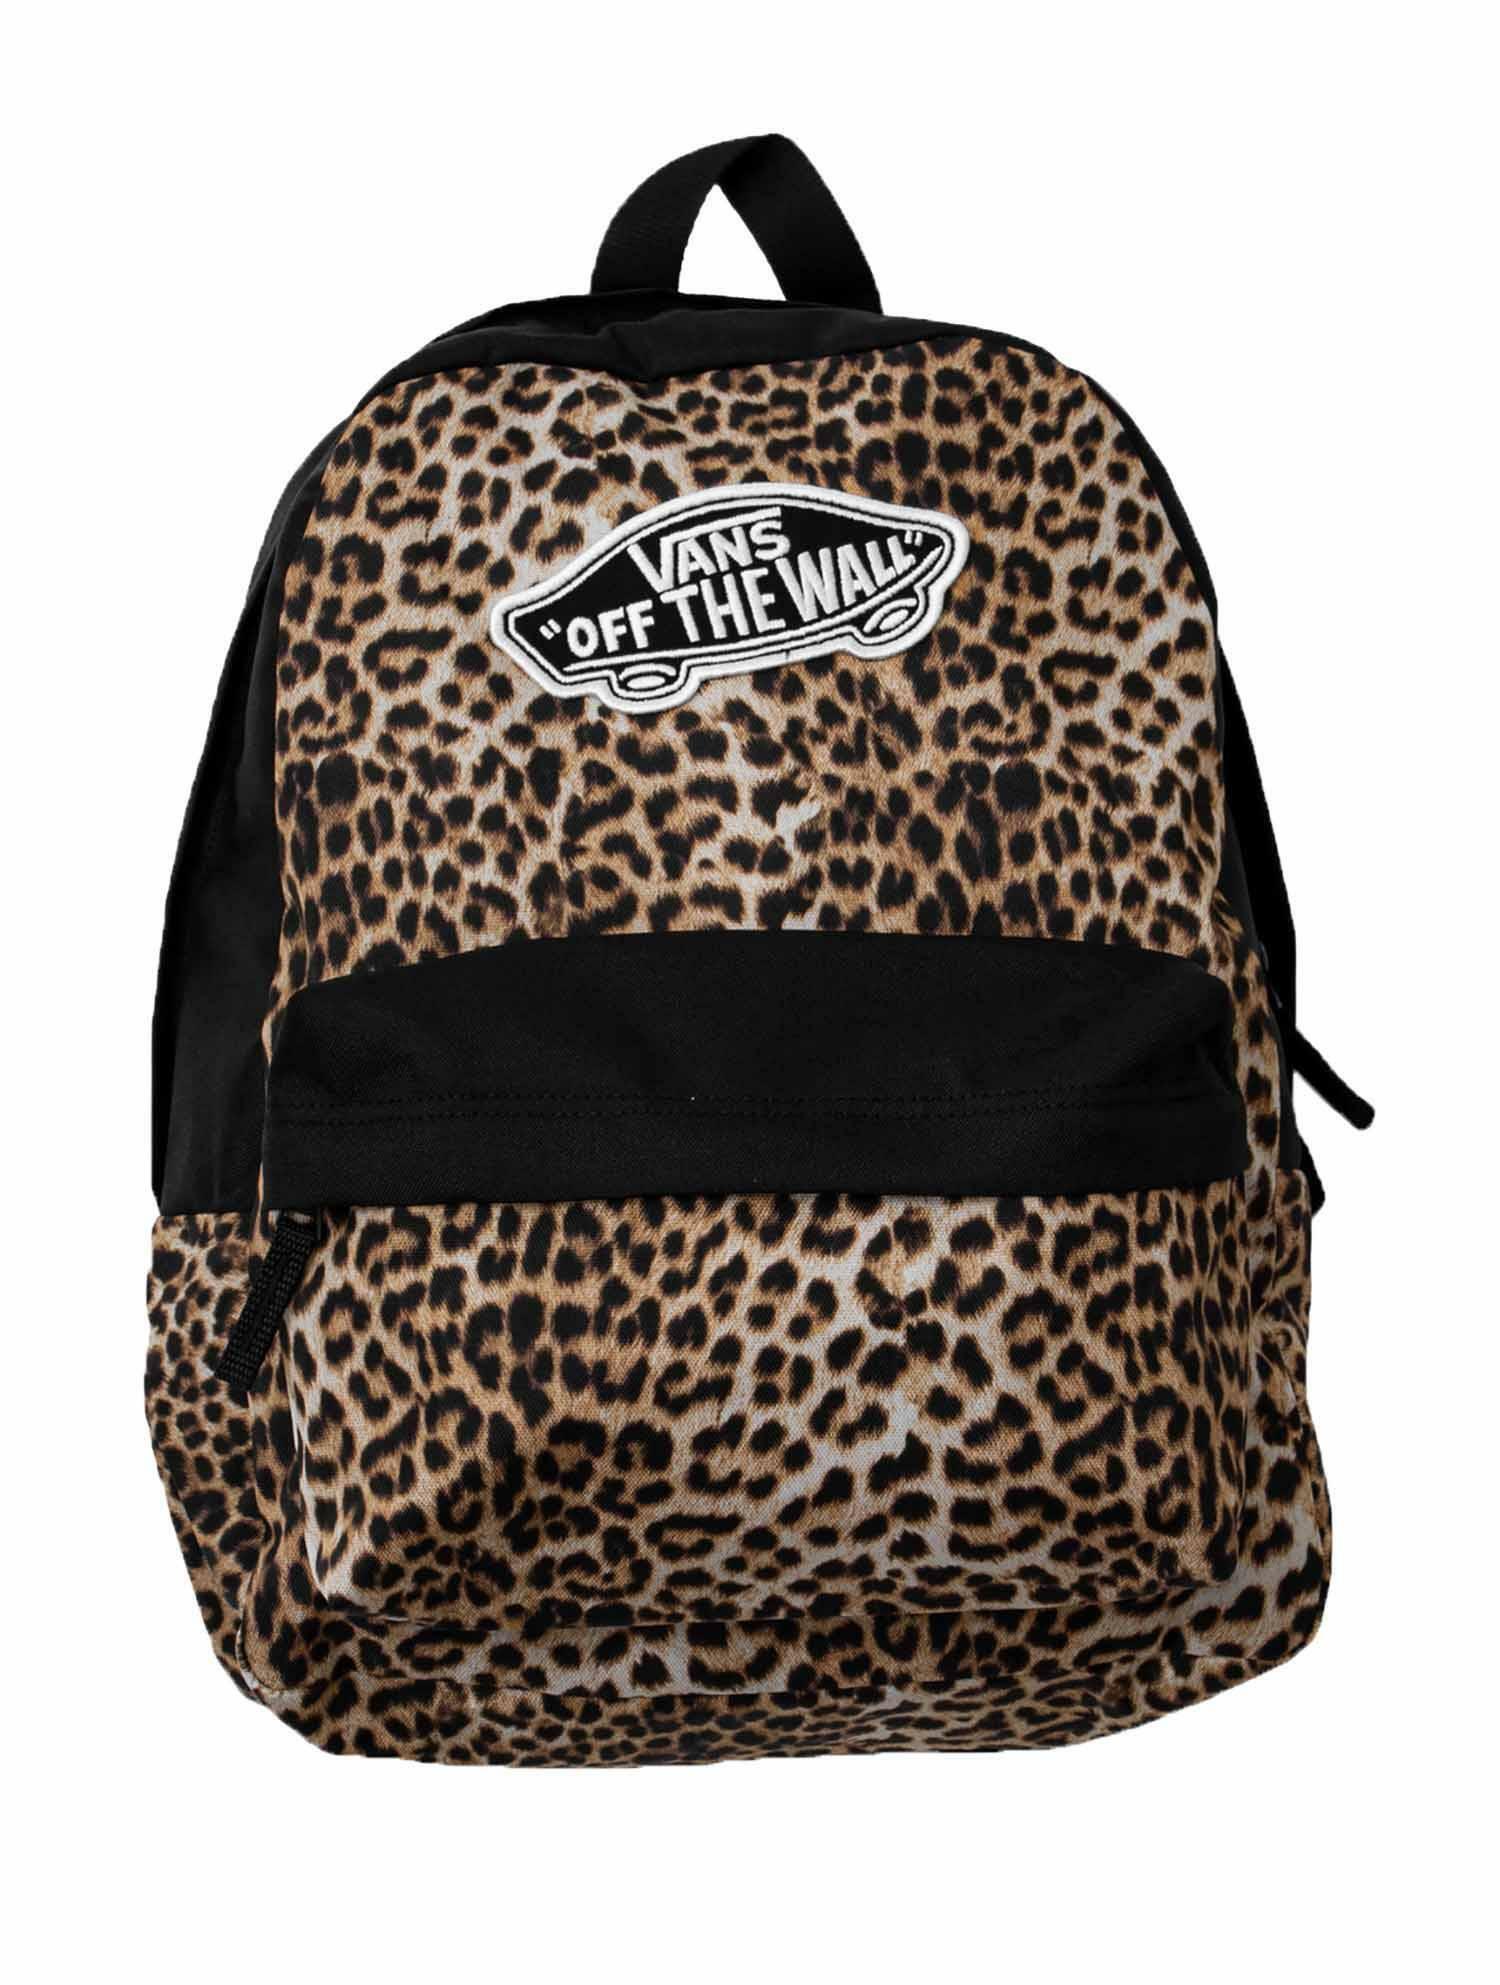 Vans zaino vans realm backpack vn0a3ui6zv21 donna leopardato